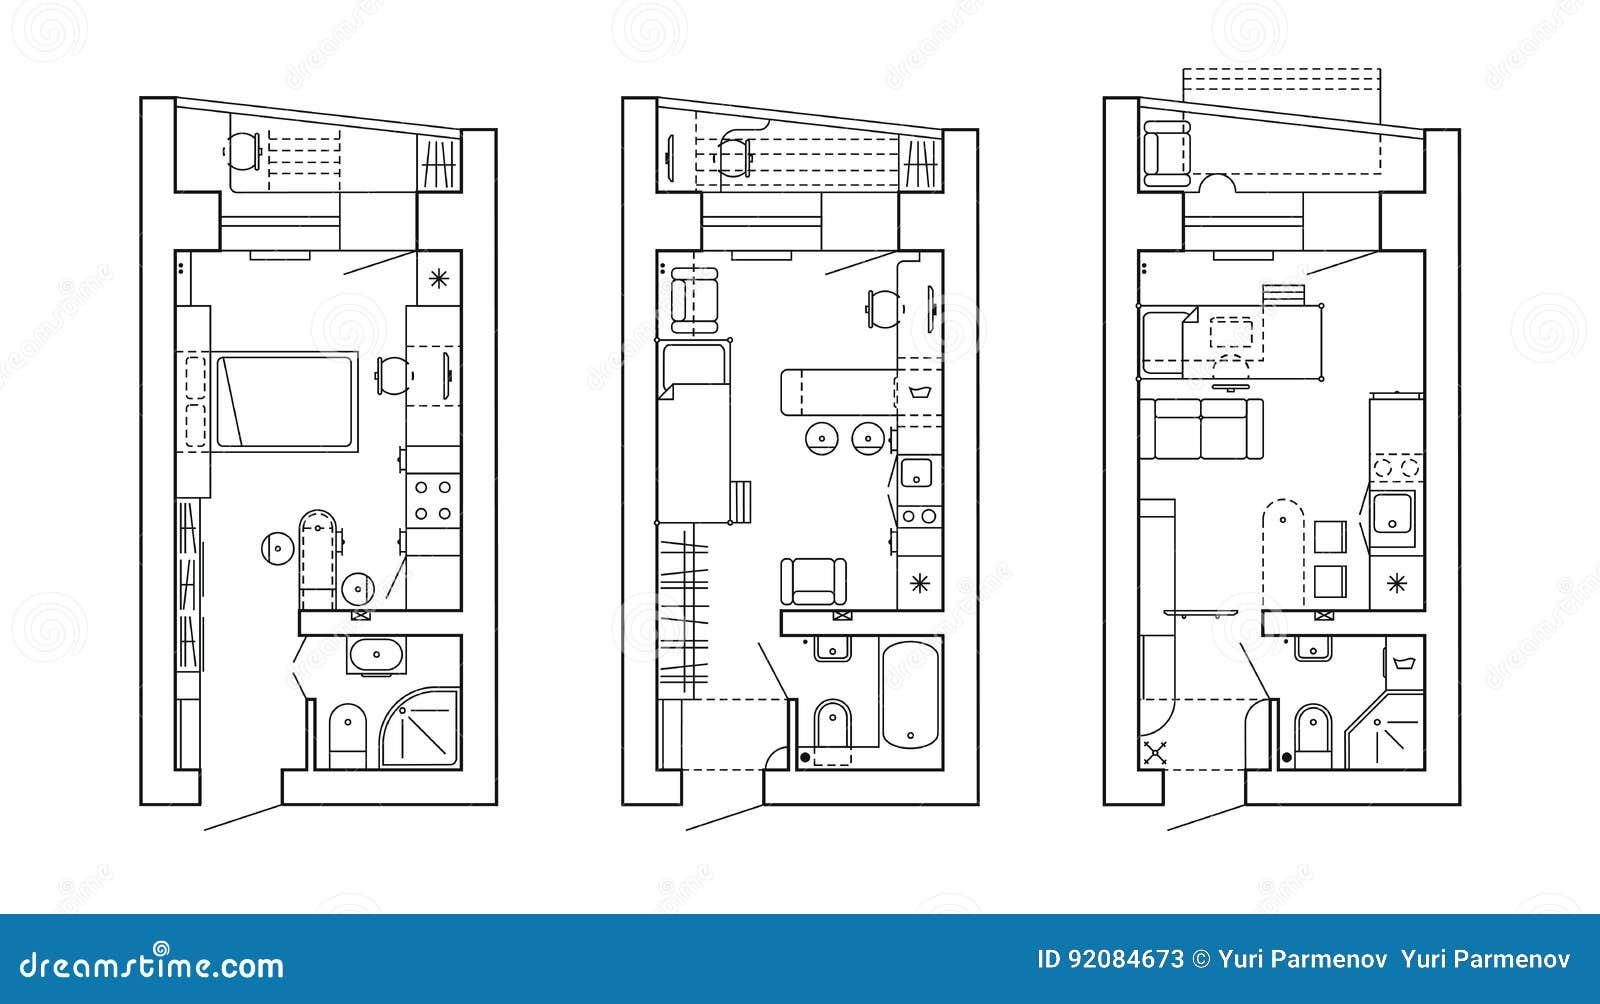 Muebles Dibujo Arquitectonico - Plan Arquitect Nico De Una Casa Disposici N Del Apartamento Con [mjhdah]http://2.bp.blogspot.com/-lj5nO6i9dpM/UyUJRnNPChI/AAAAAAAAAbc/lBnCijNl7DQ/s1600/Planta-Baja.jpg